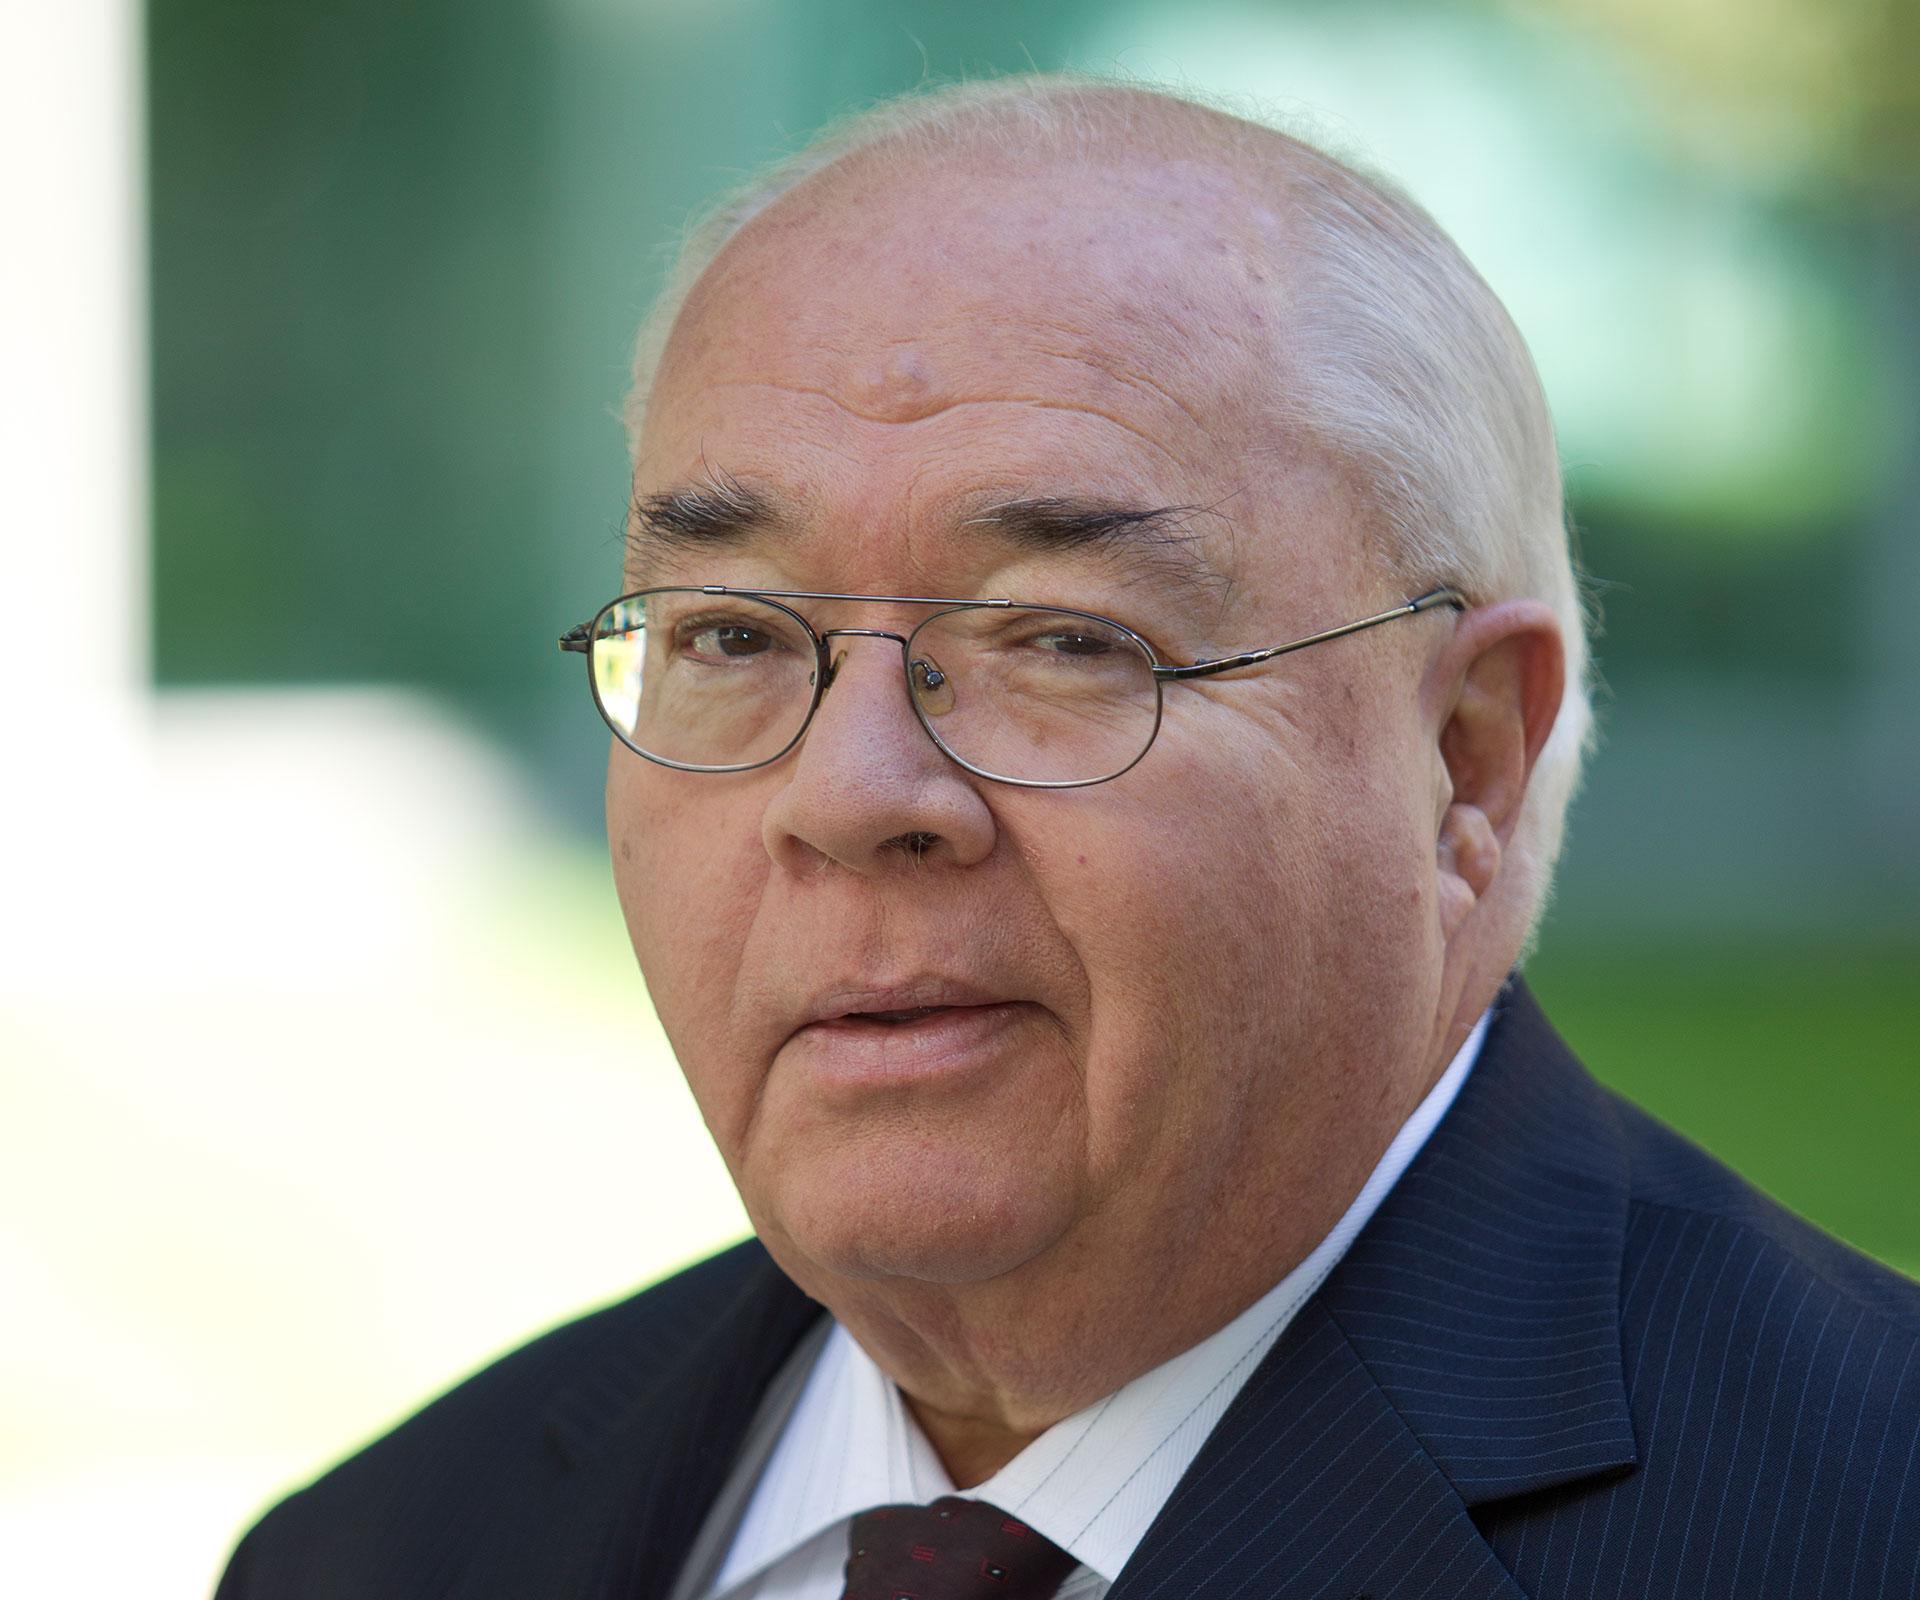 'It's time': Political reporter Oakes announces retirement